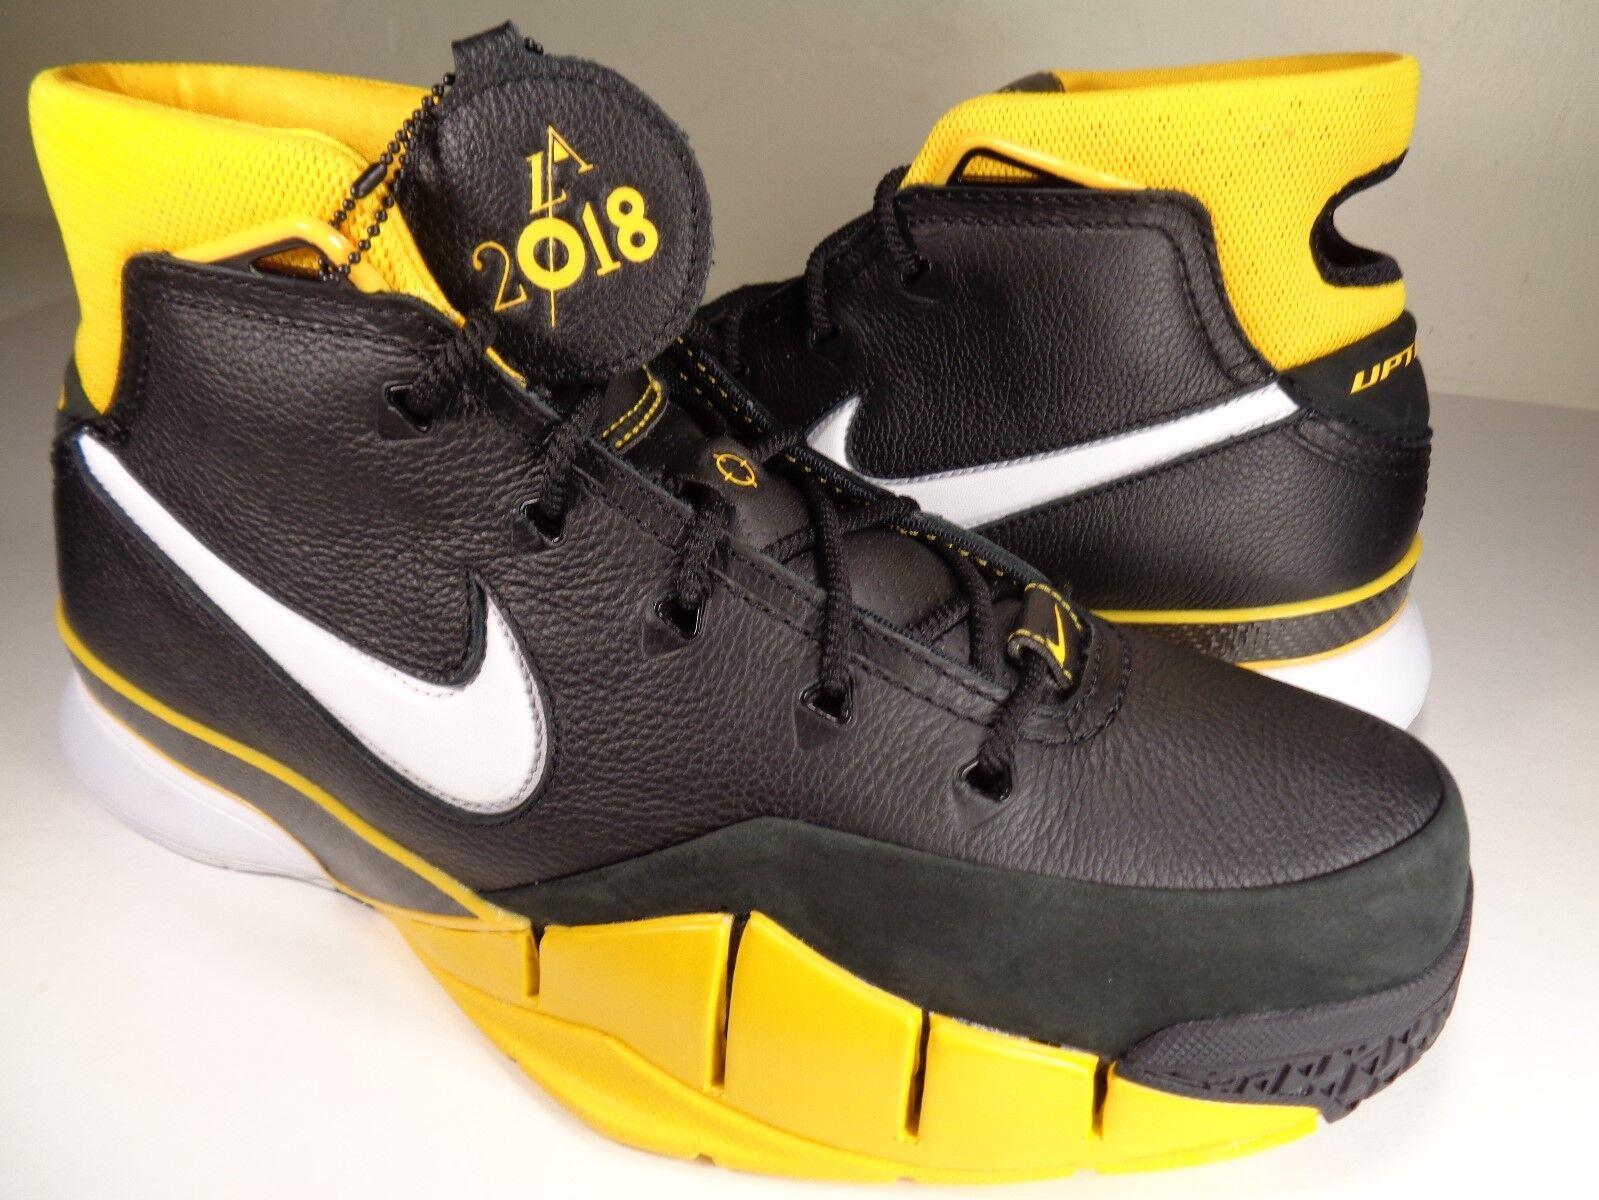 Nike Kobe Kobe Kobe 1 Prossoro Del Sol nero giallo bianca Varsity Maize SZ 11.5 (AQ2728-003) 8ffb3a